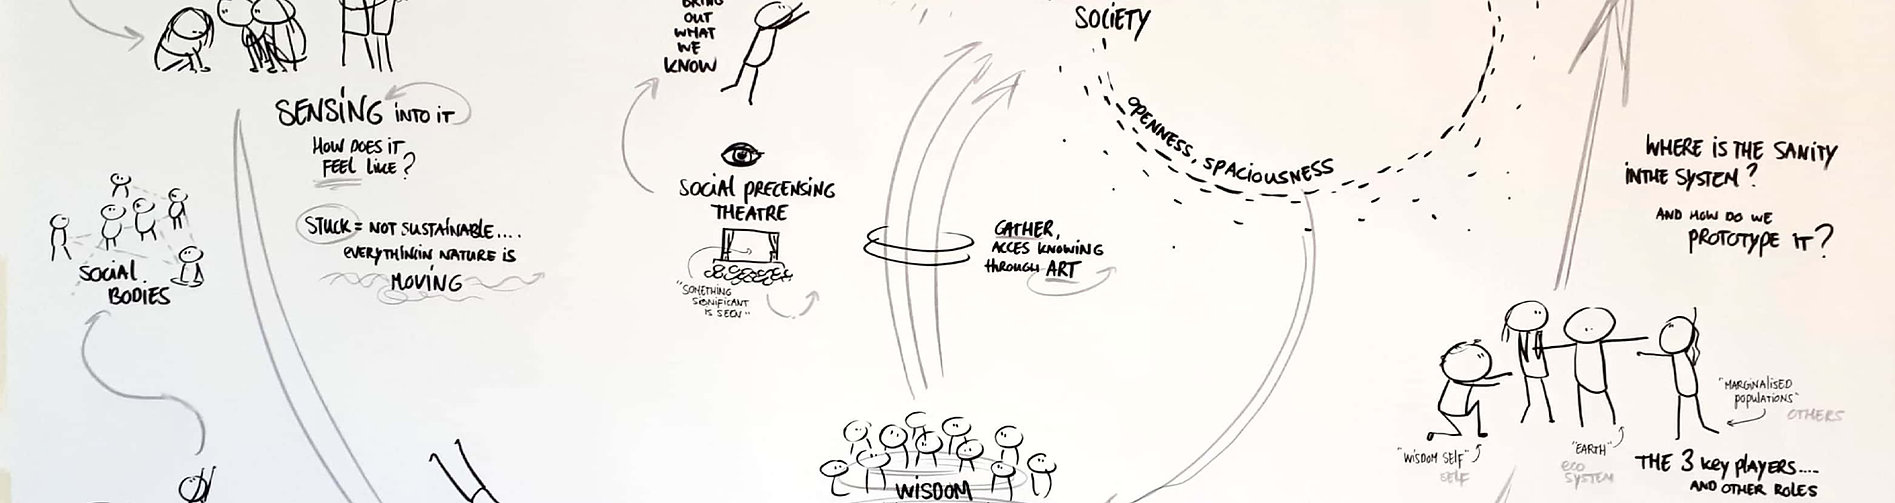 Social Precencing Theatre drawing.jpg